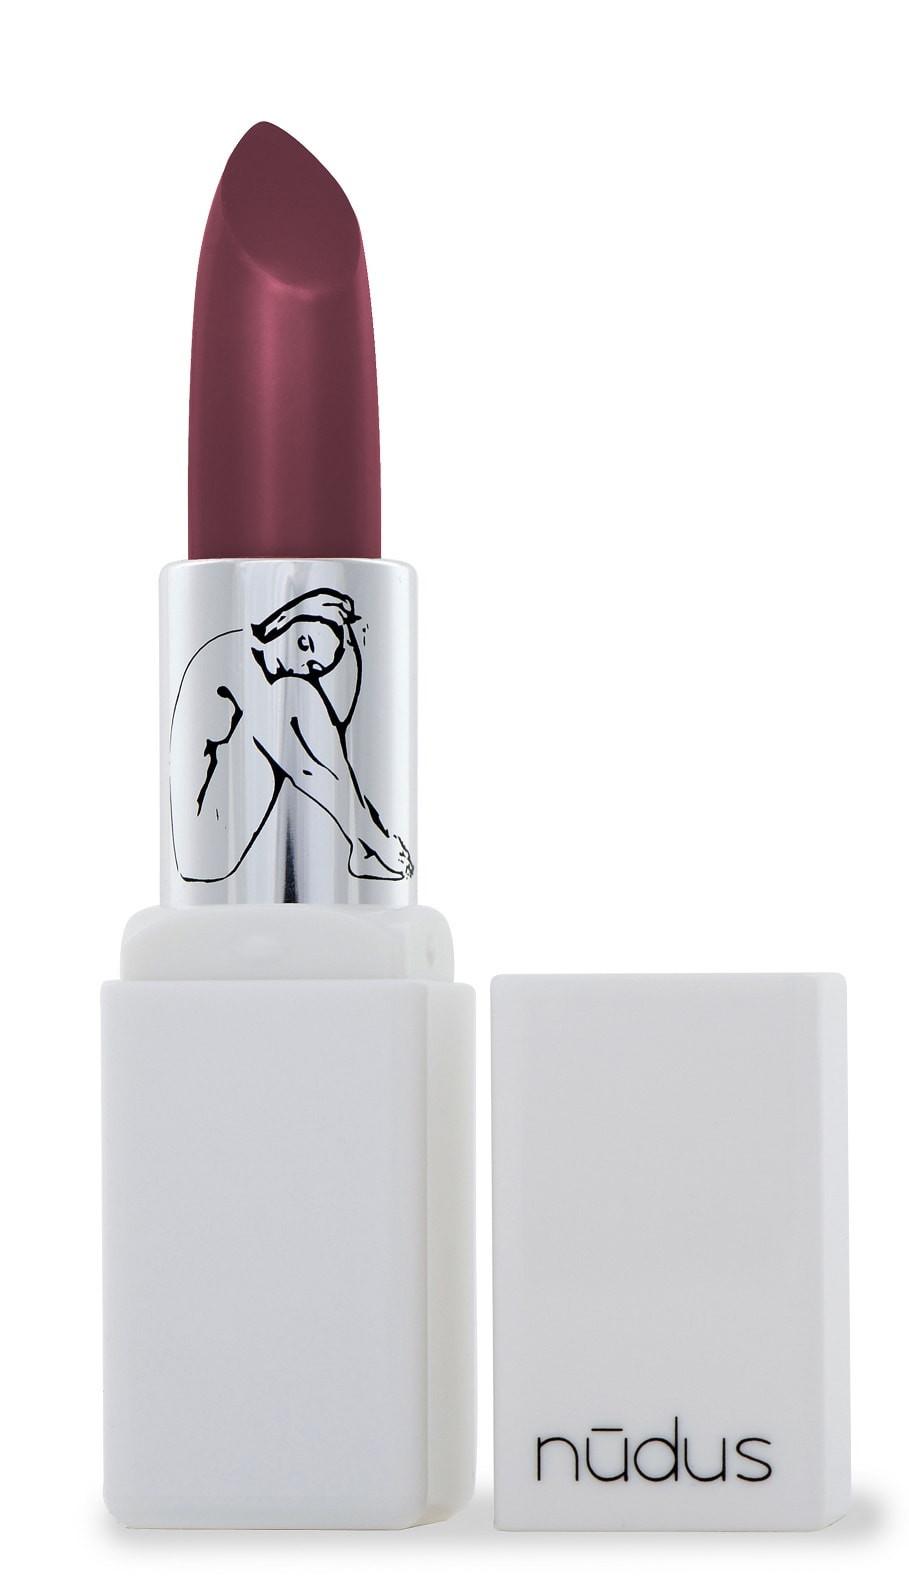 NUDUS certified organic lipstick in dream time